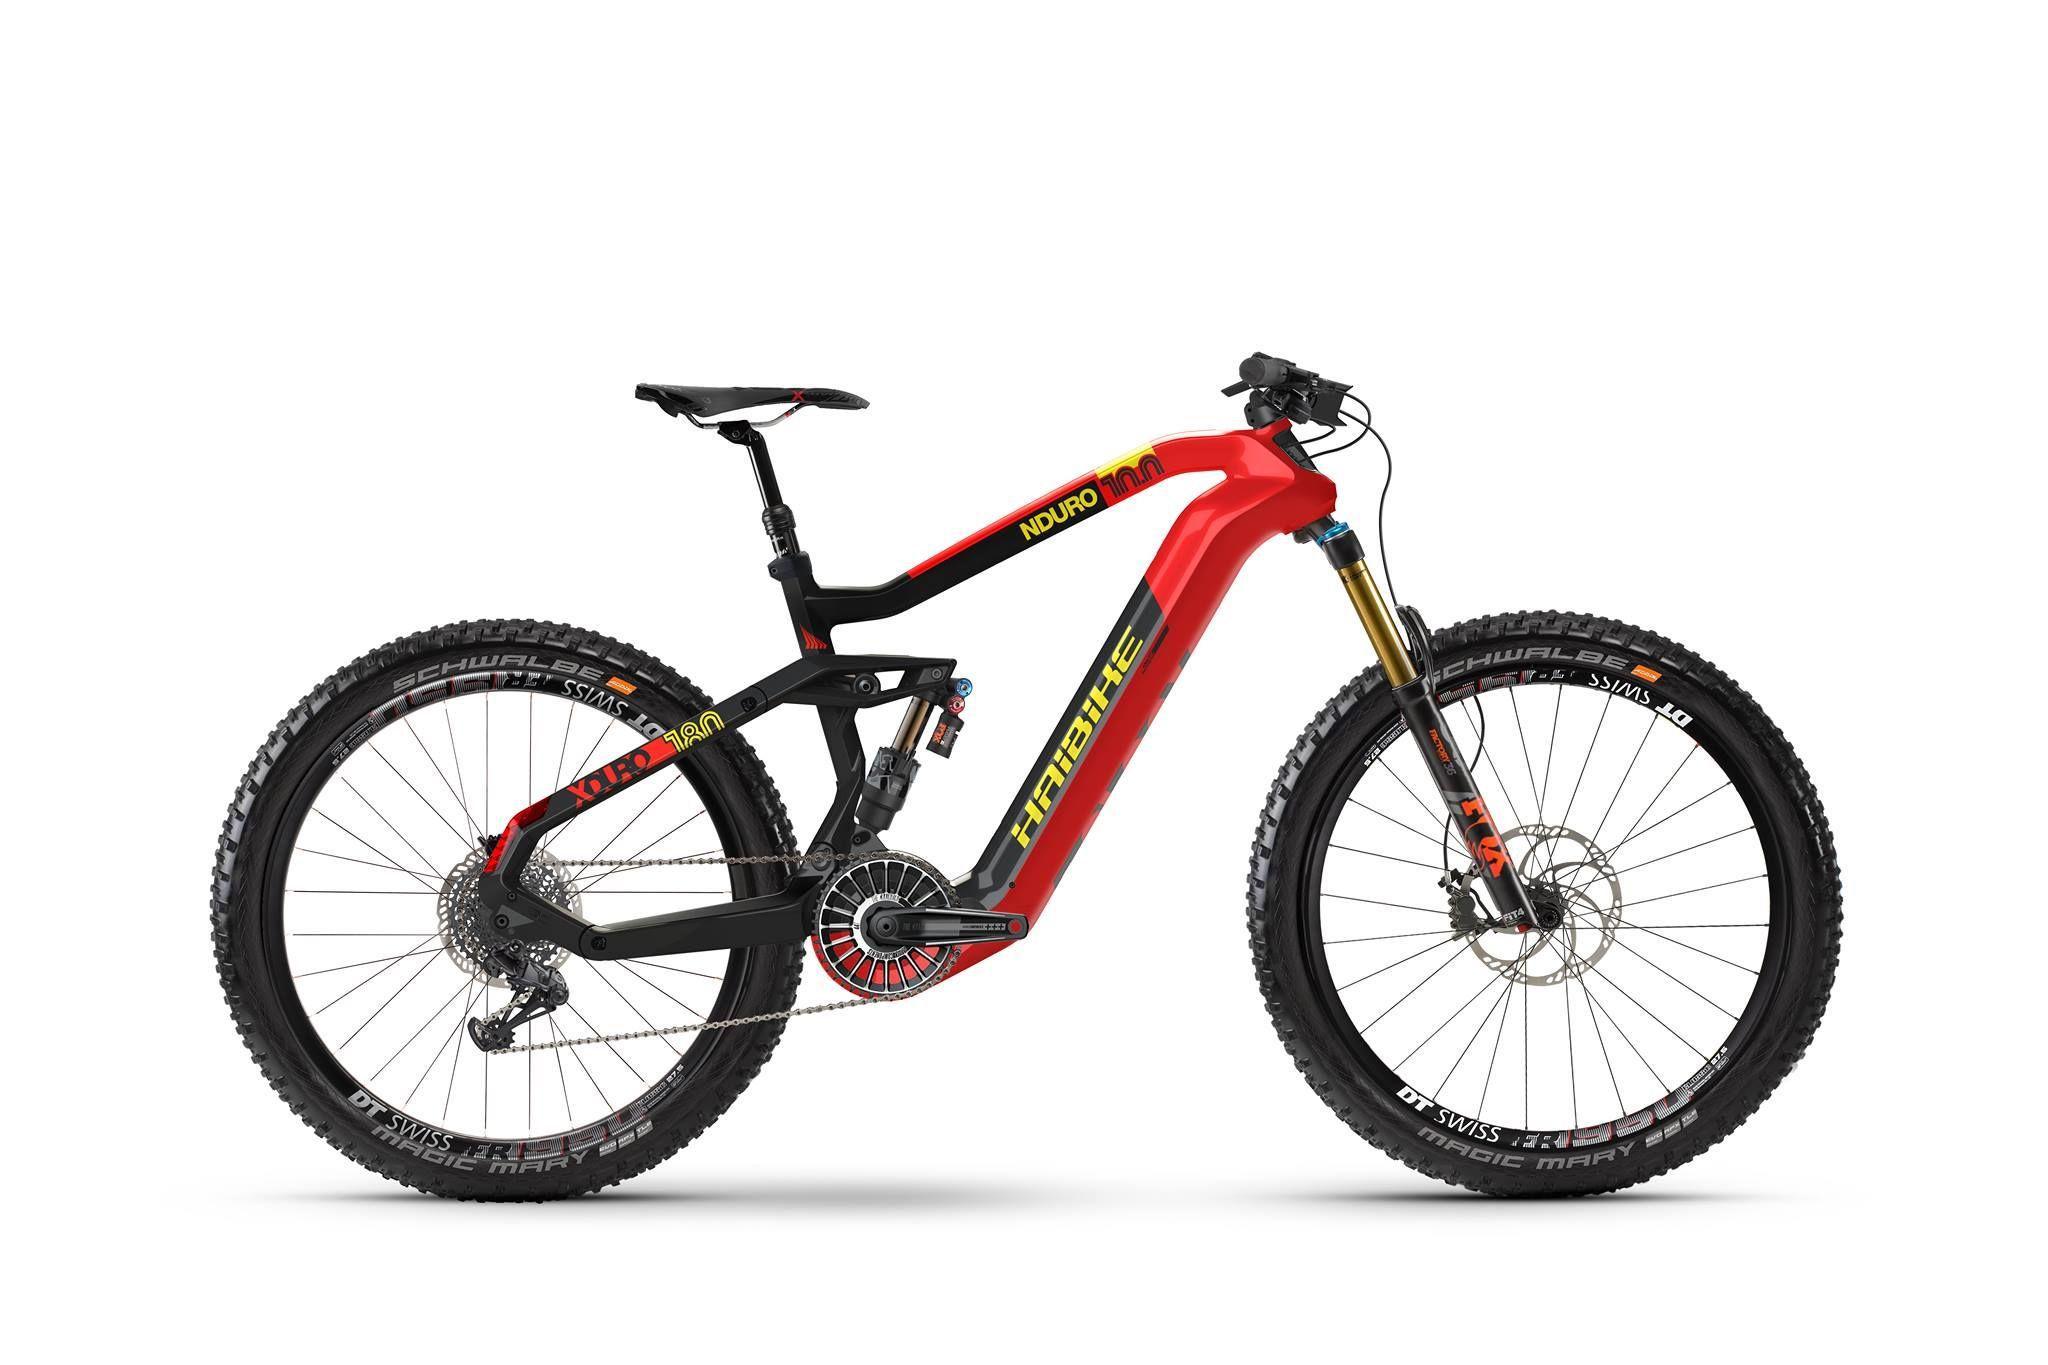 Haibike Flyon 2019 Eperformance System And Haibike Models E Bike